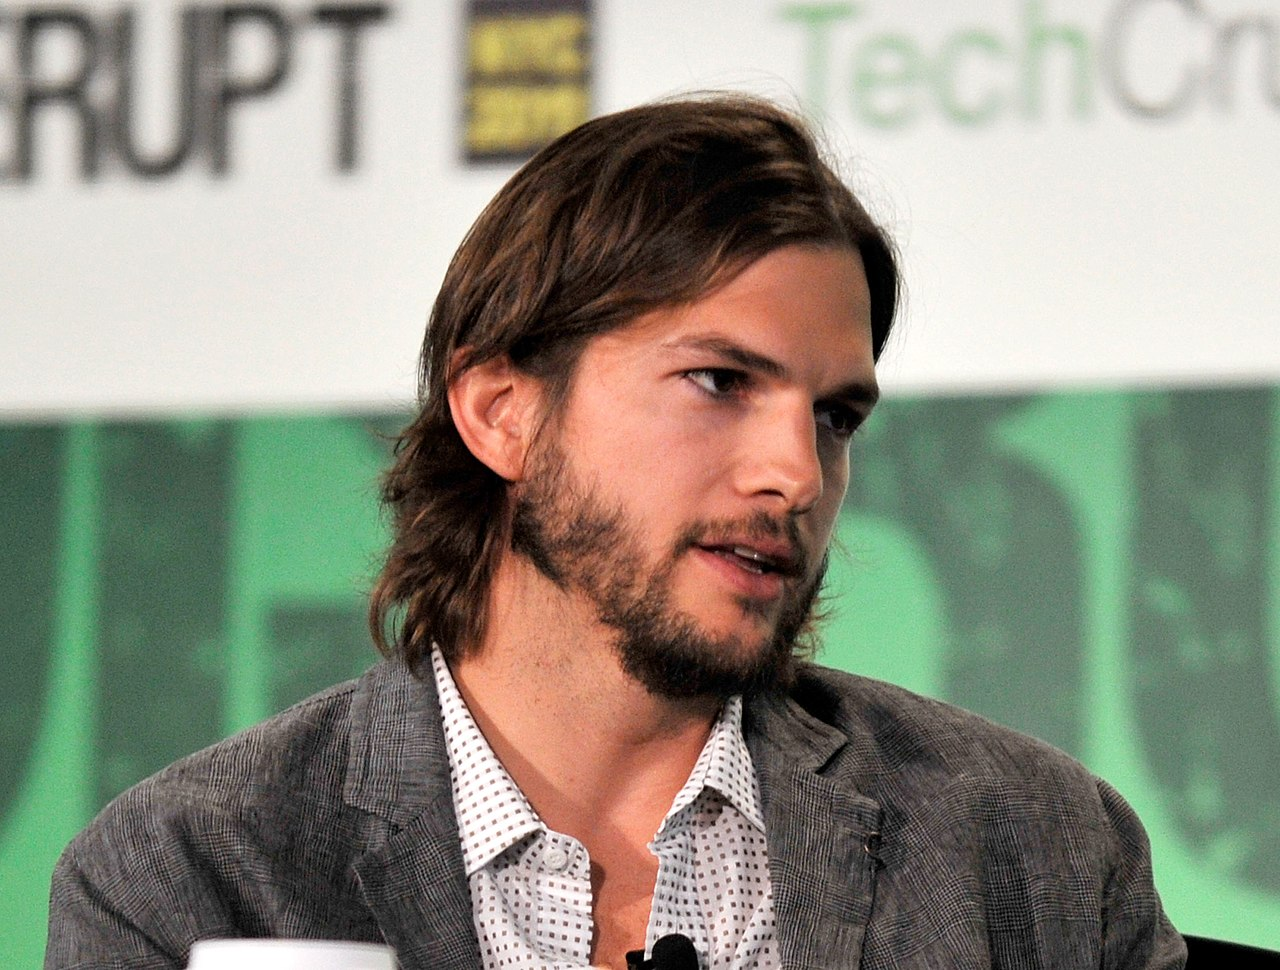 File Ashton Kutcher During Techcrunch Disrupt New York May 2011 5 Jpg Wikimedia Commons